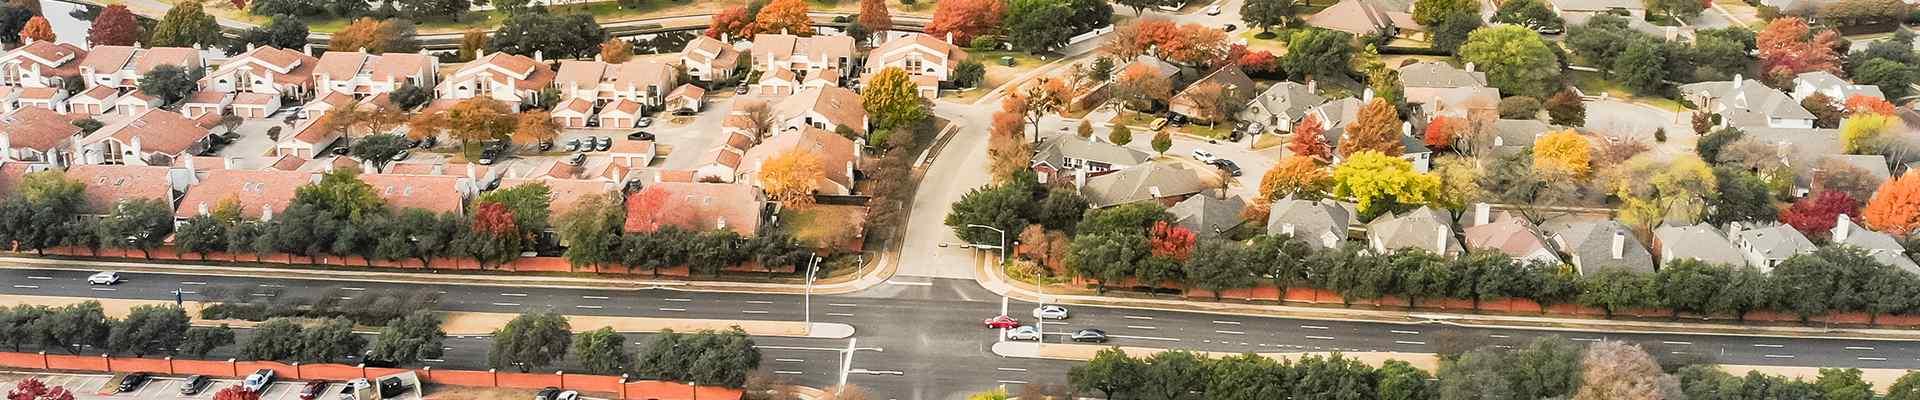 a suburban neighborhood in richland hills texas